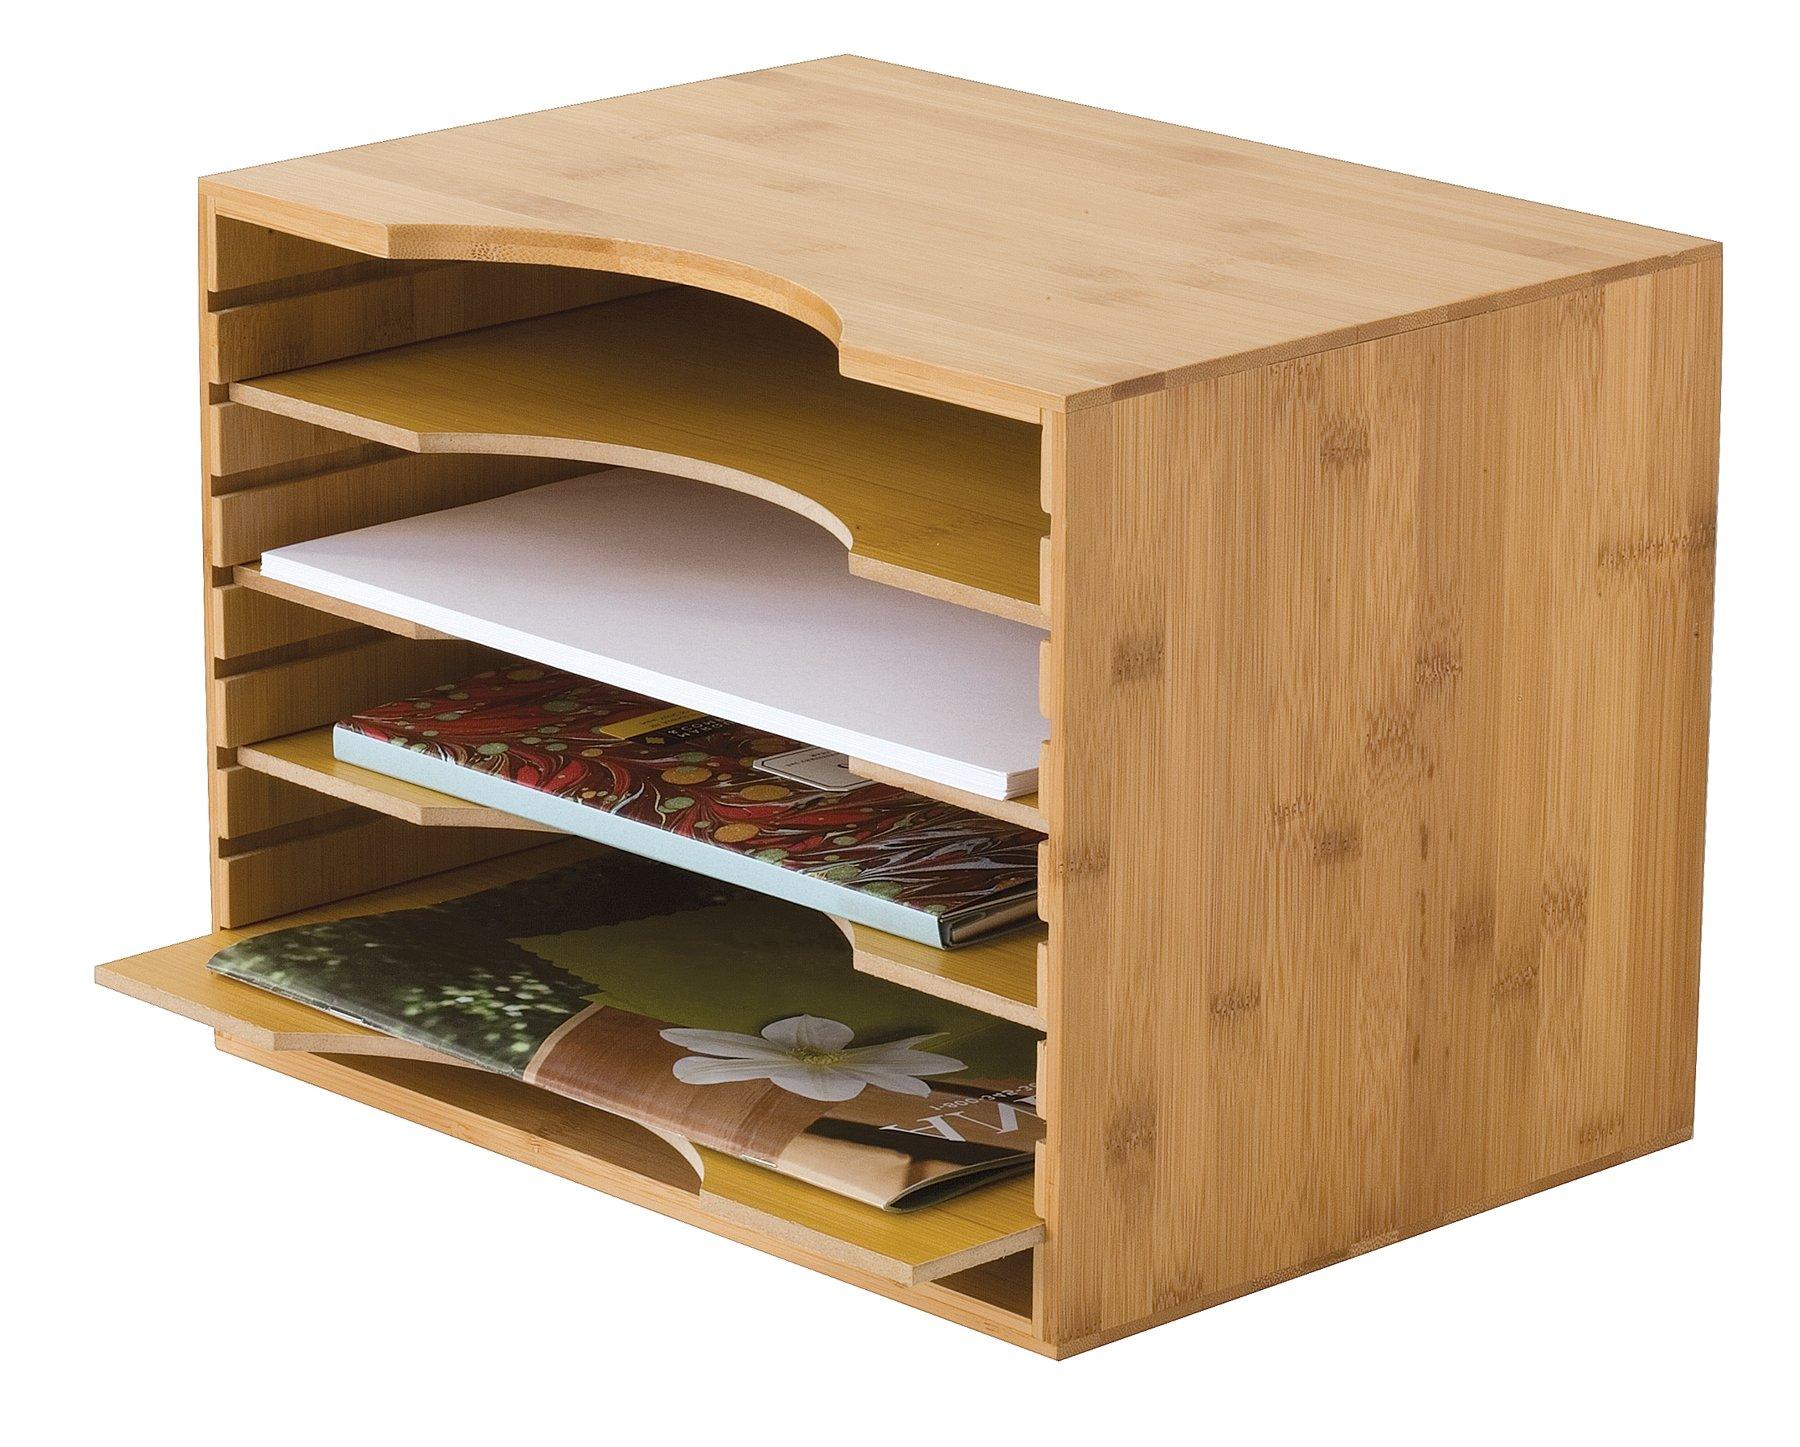 Lipper International 811 Bamboo Wood File Organizer with 4 Dividers, 12 3/4'' x 9 1/4'' x 9 1/2'' by Lipper International